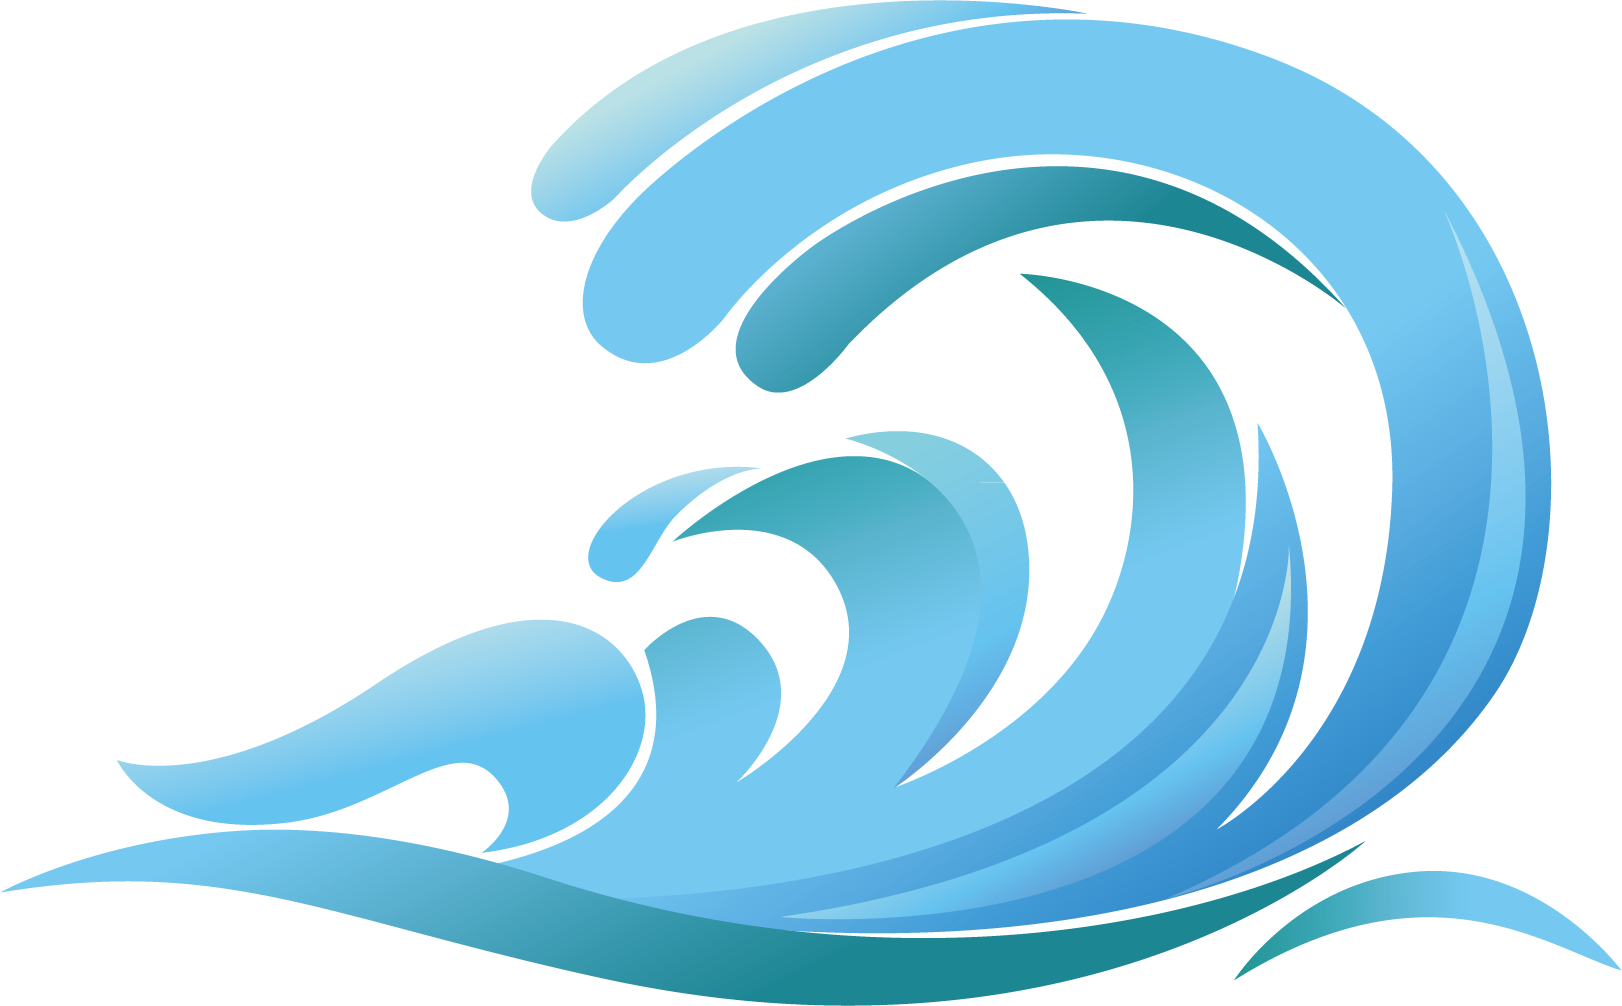 Splash clipart beach wave. Water drop clip art